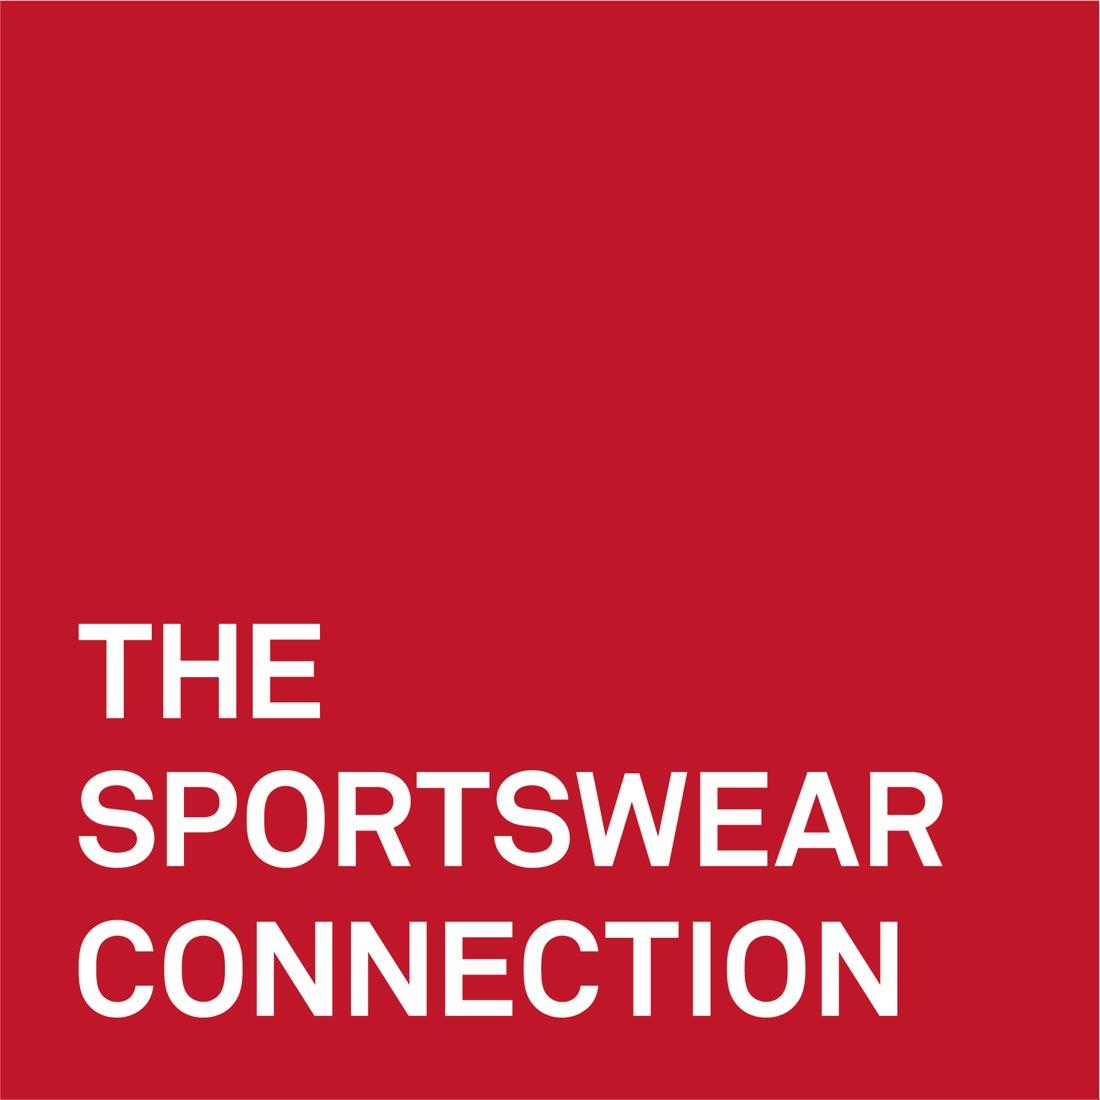 Sportswear Connection